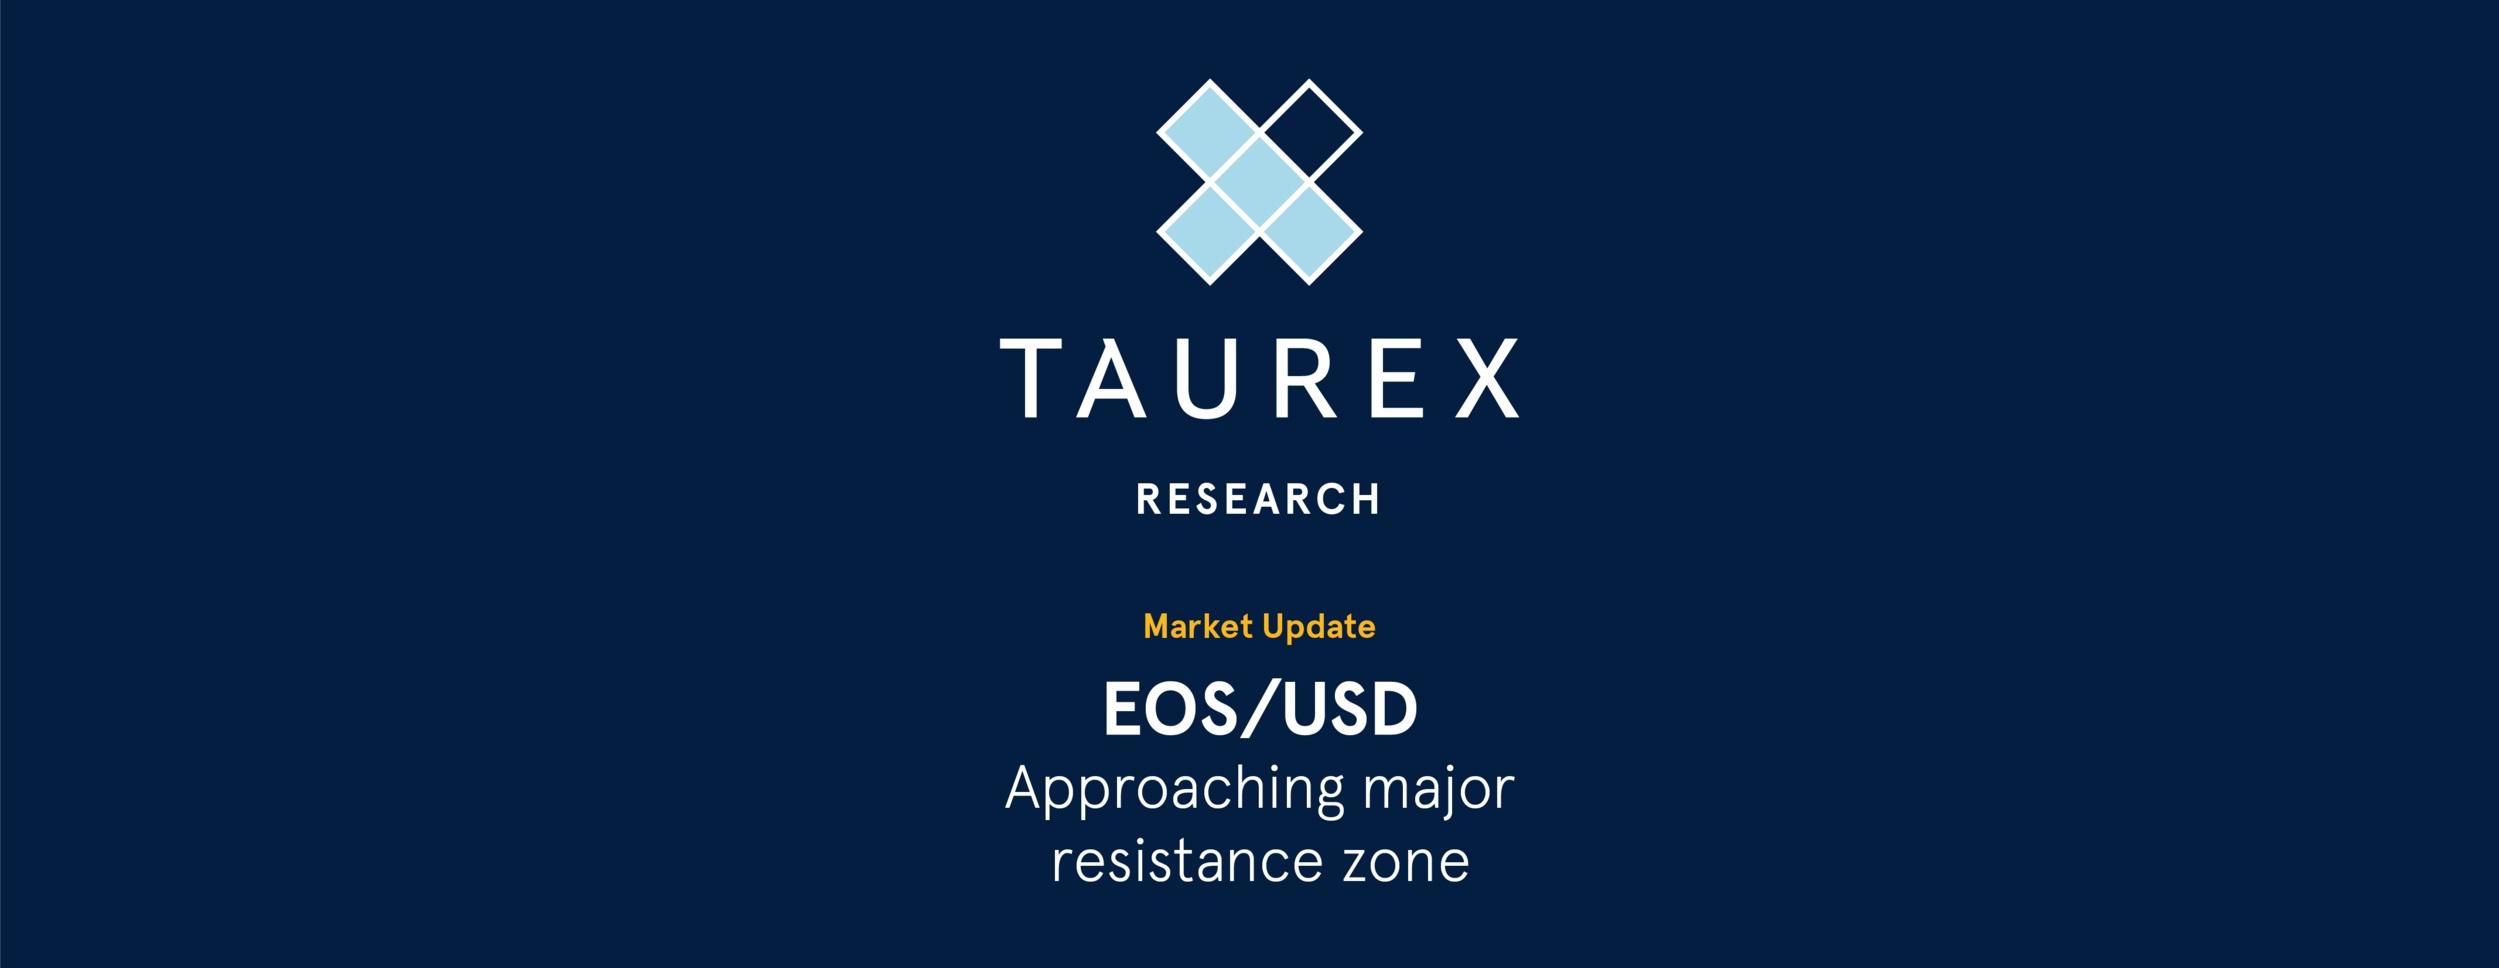 20190213_Market_Update_Twitter.jpg